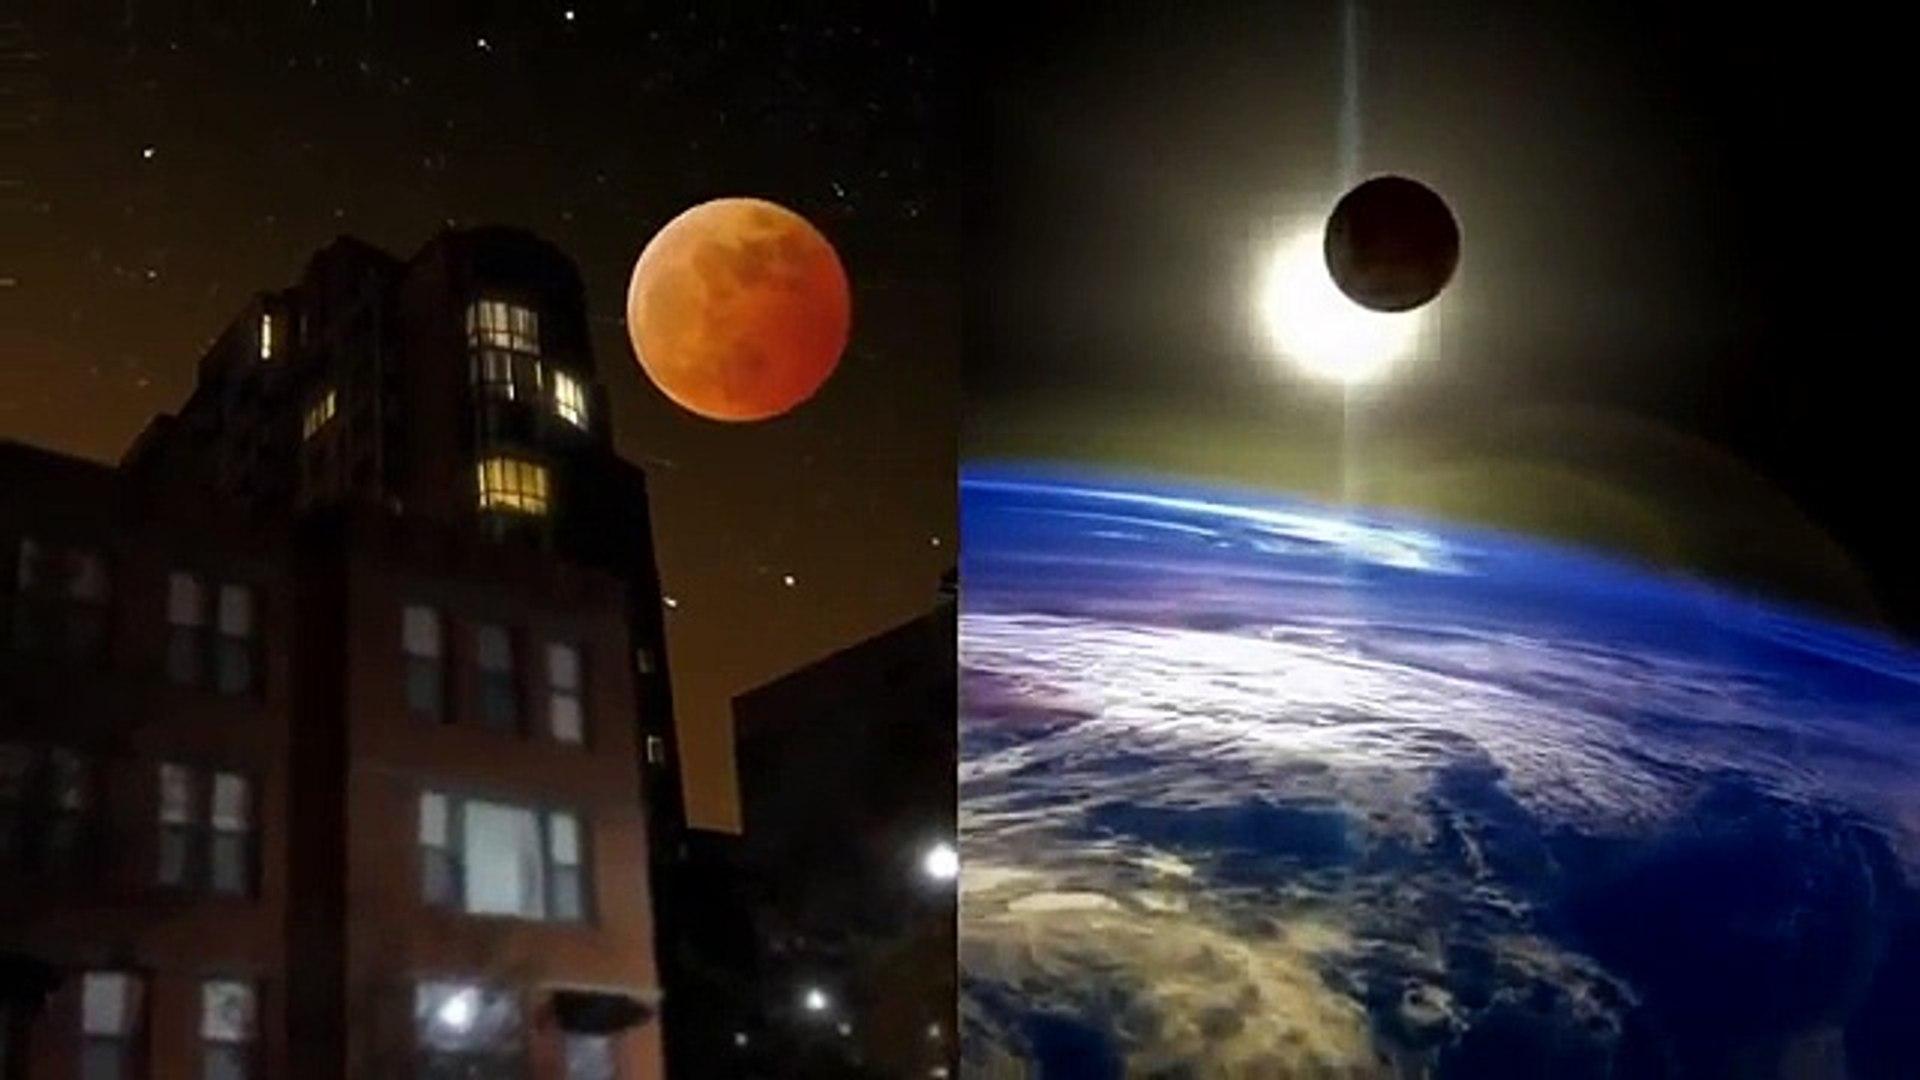 Dangerous - Blood Moon rare total lunar eclipse (NASA STREAM)